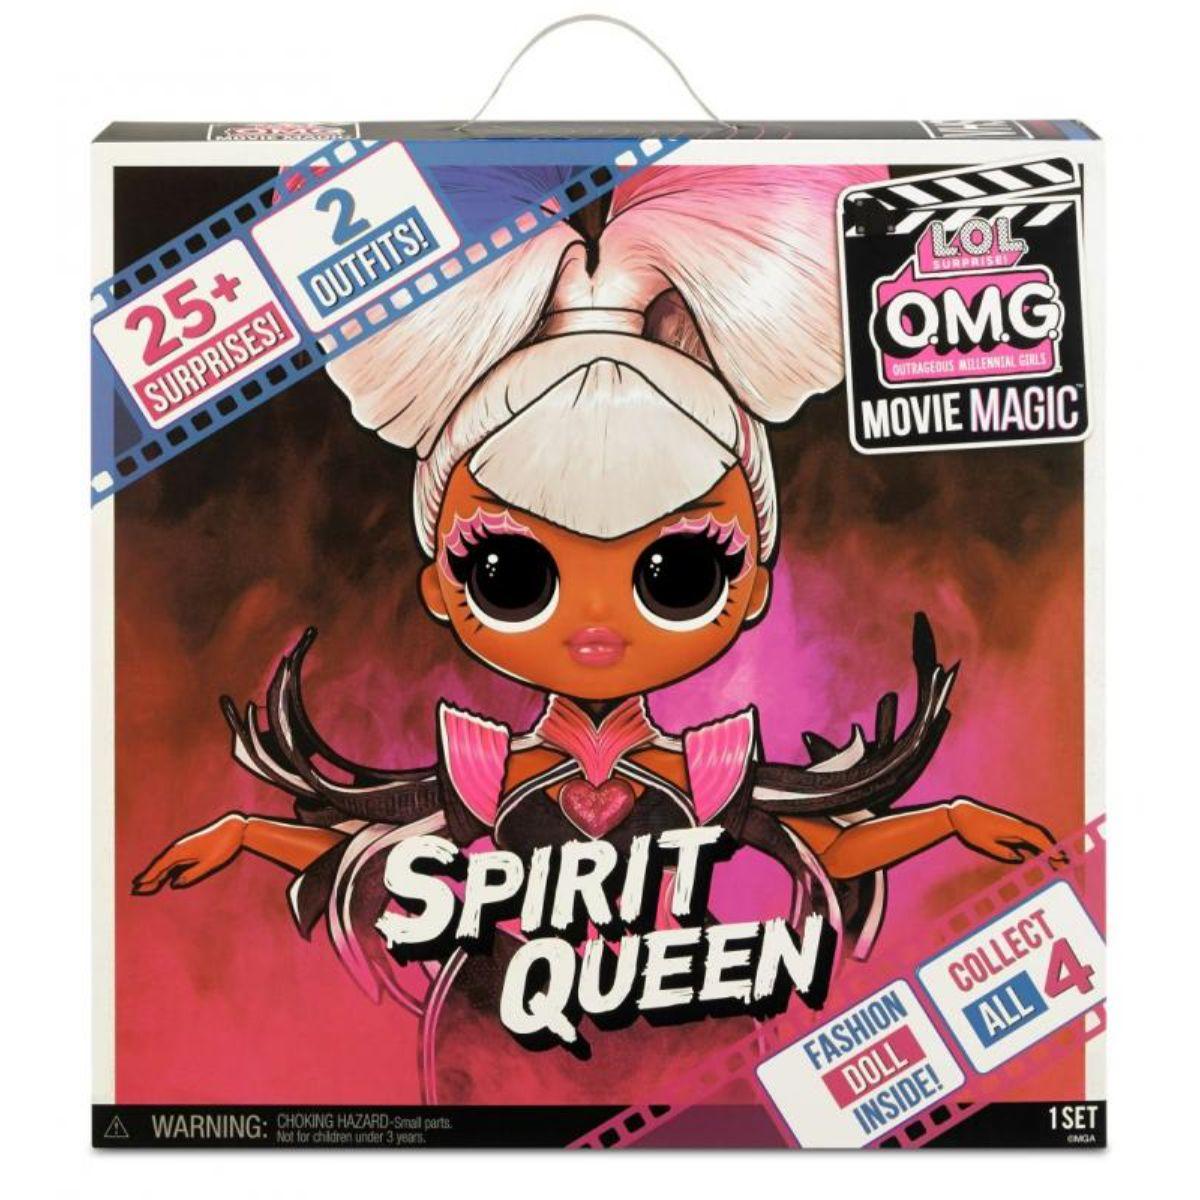 Papusa LOL Surprise OMG Movie, cu 25 de surprize, Spirit Queen, 577928EUC